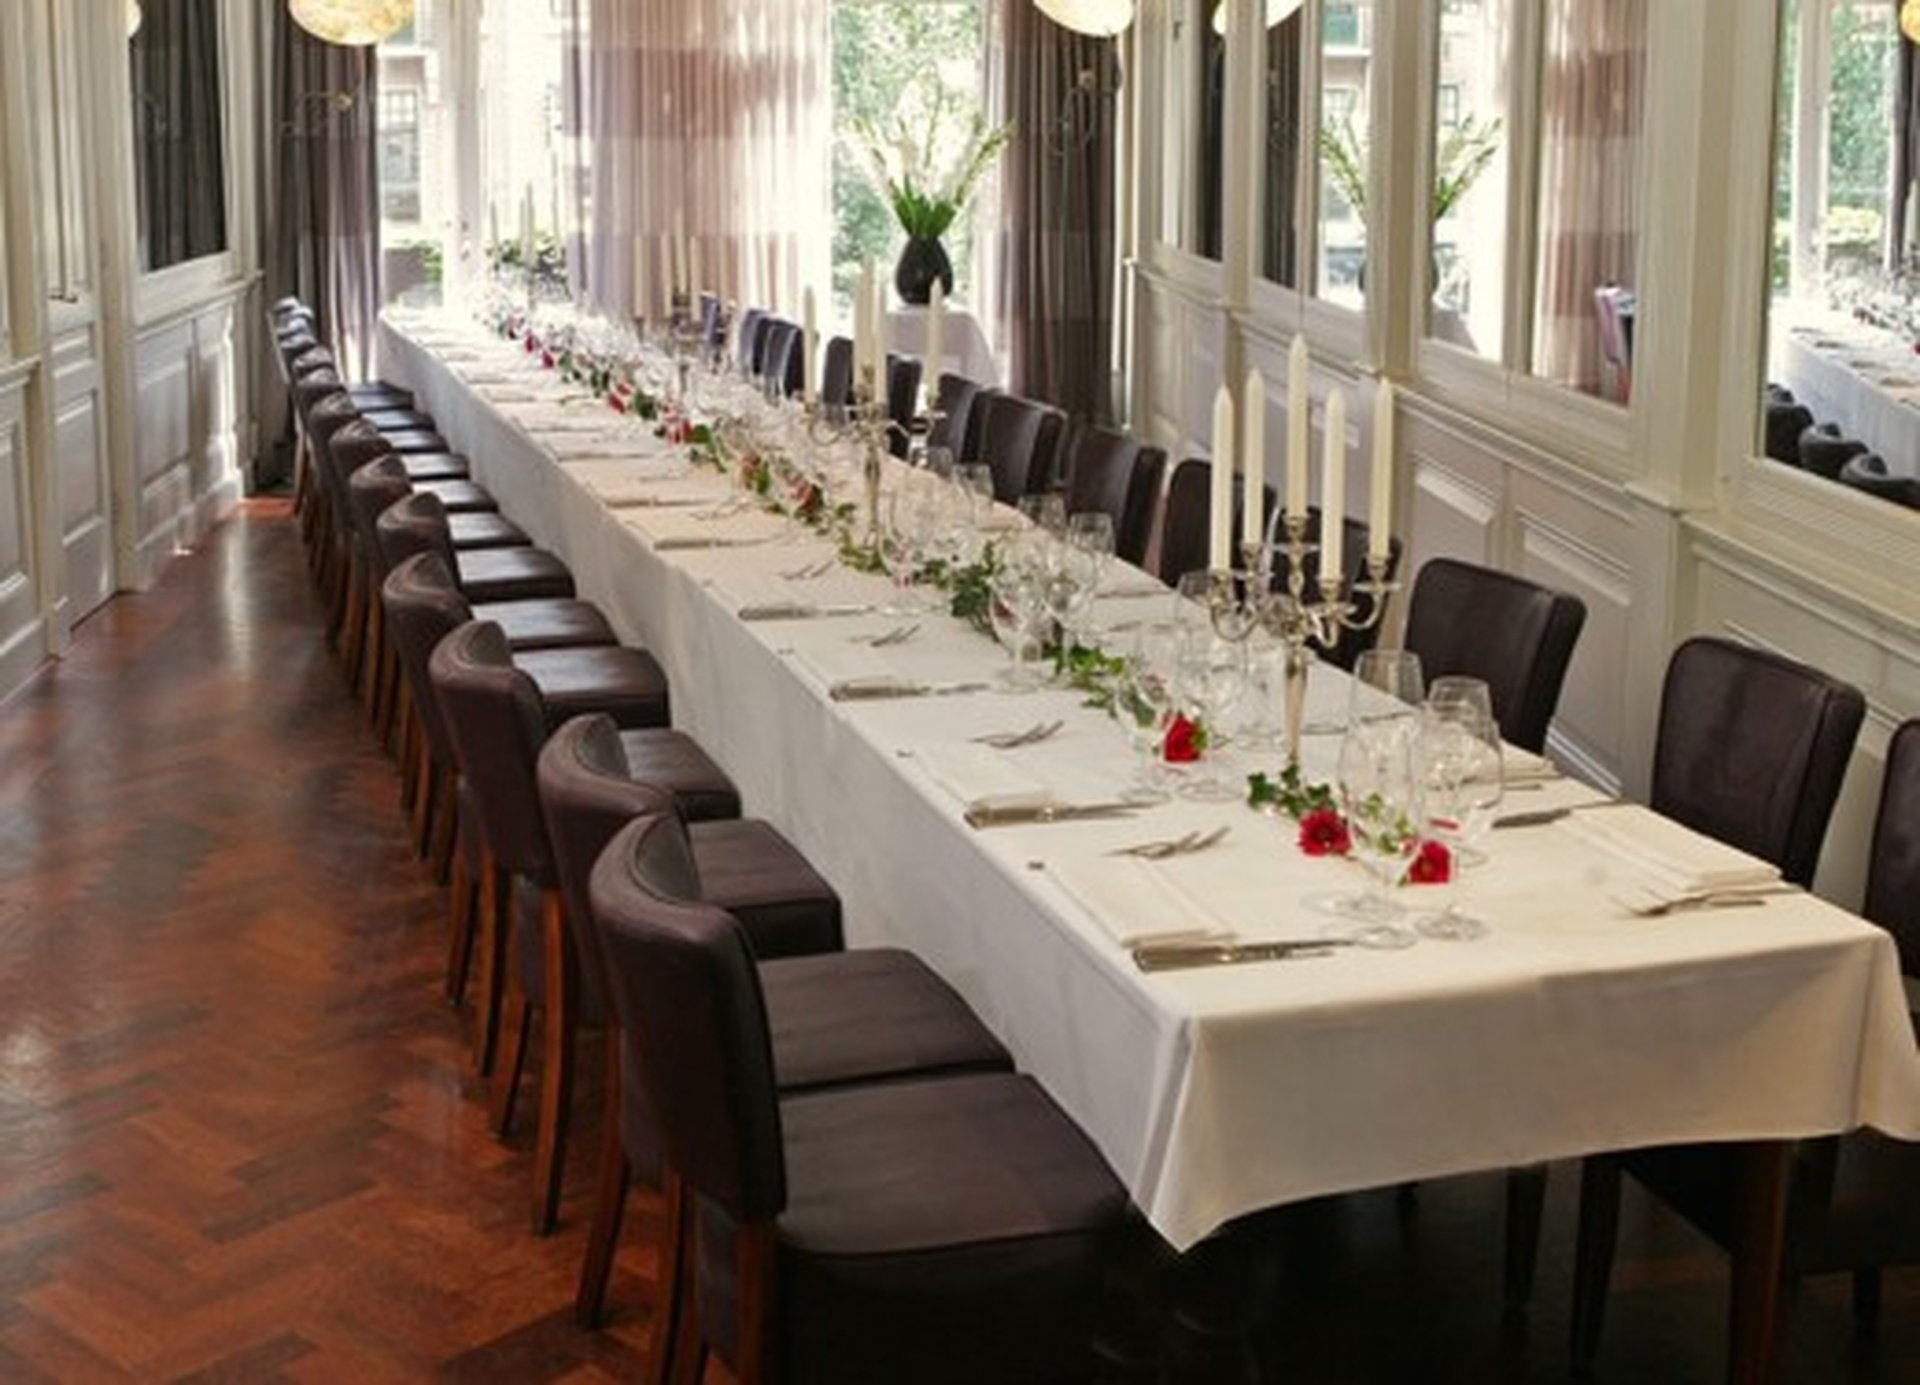 Amsterdam corporate event venues Restaurant Brasserie van Baerle image 0